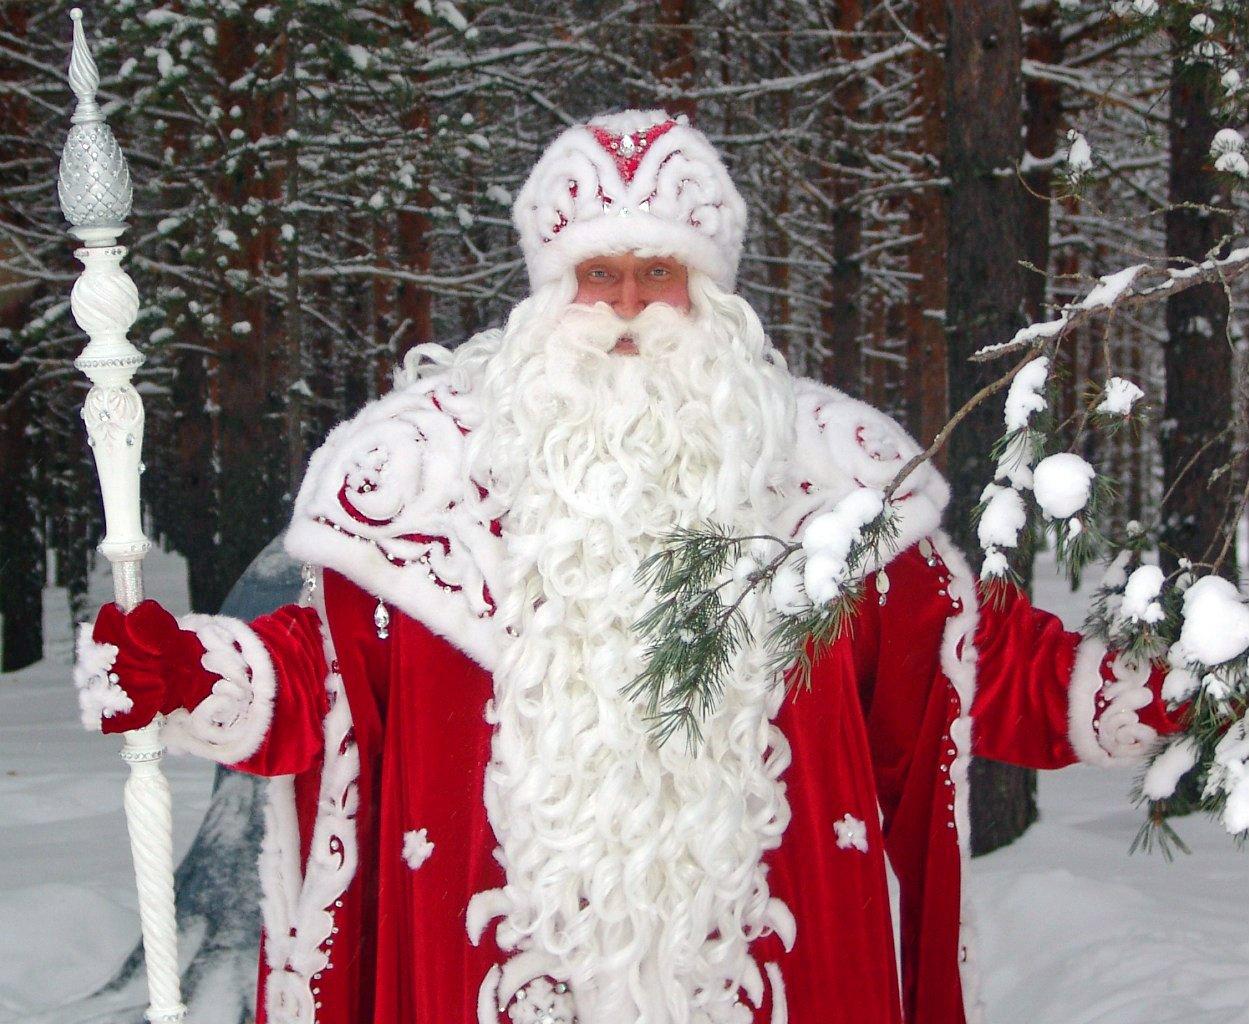 Ded Moroz con indumentaria vermella e branca, menos habirual ca azul e branca